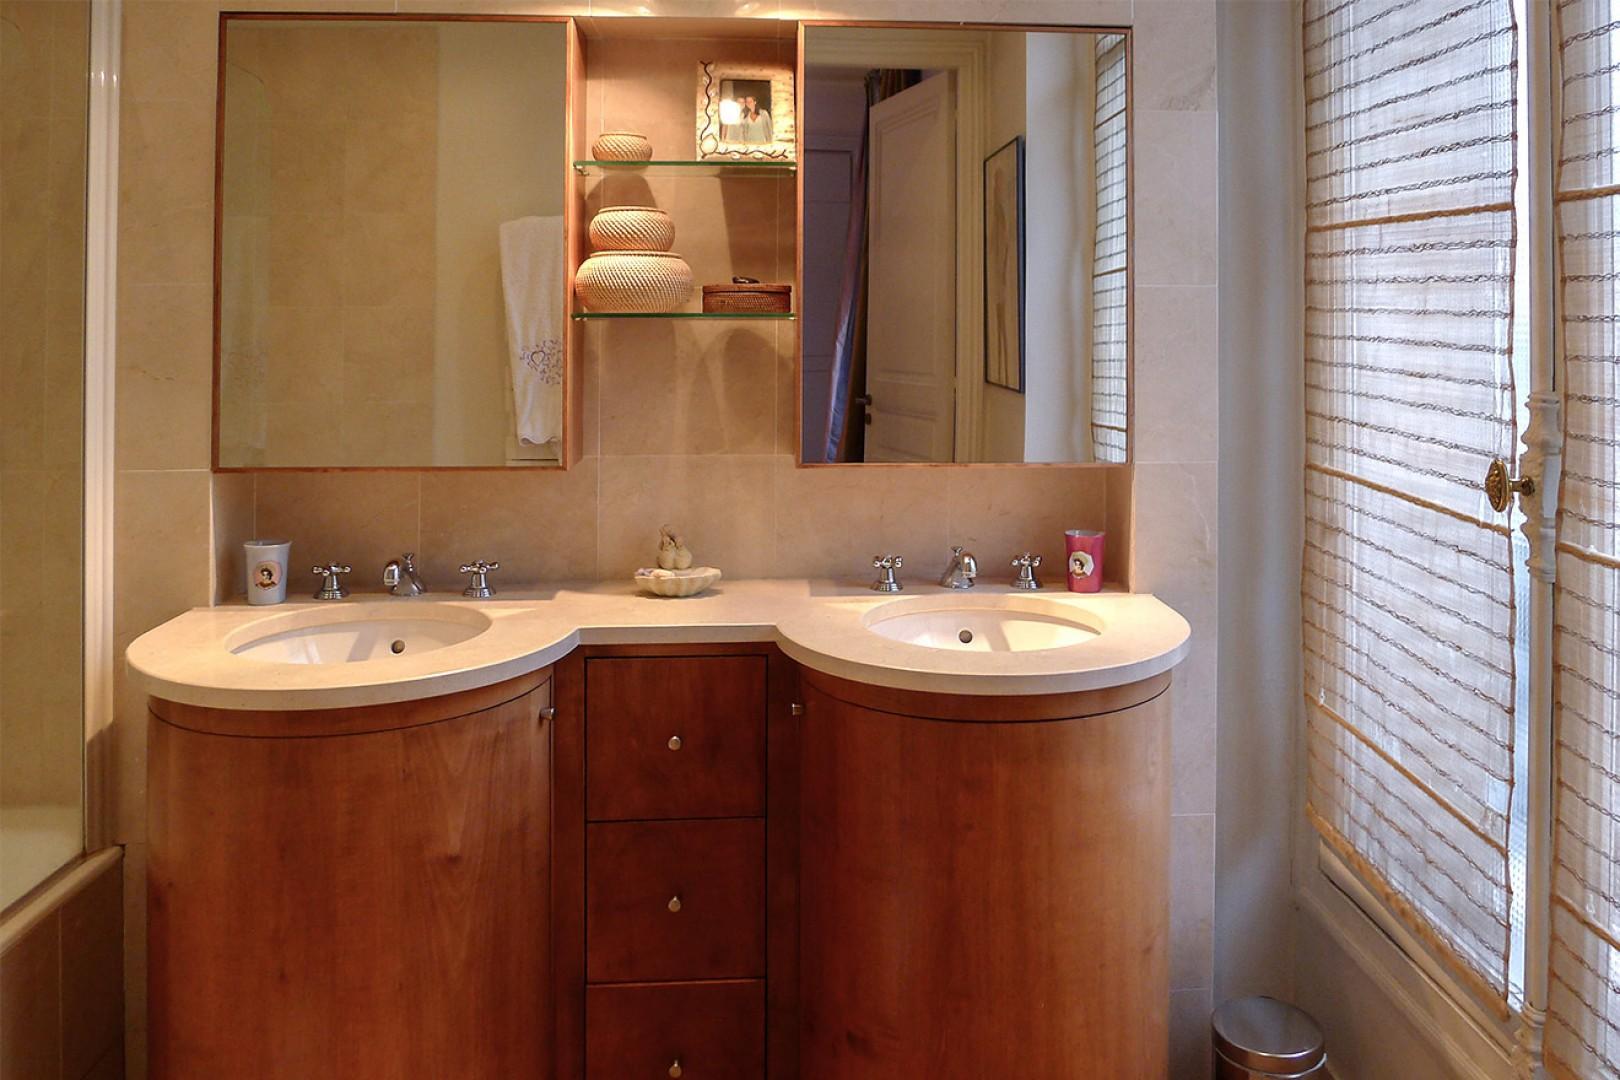 Enjoy the practical double sink in bathroom 2.